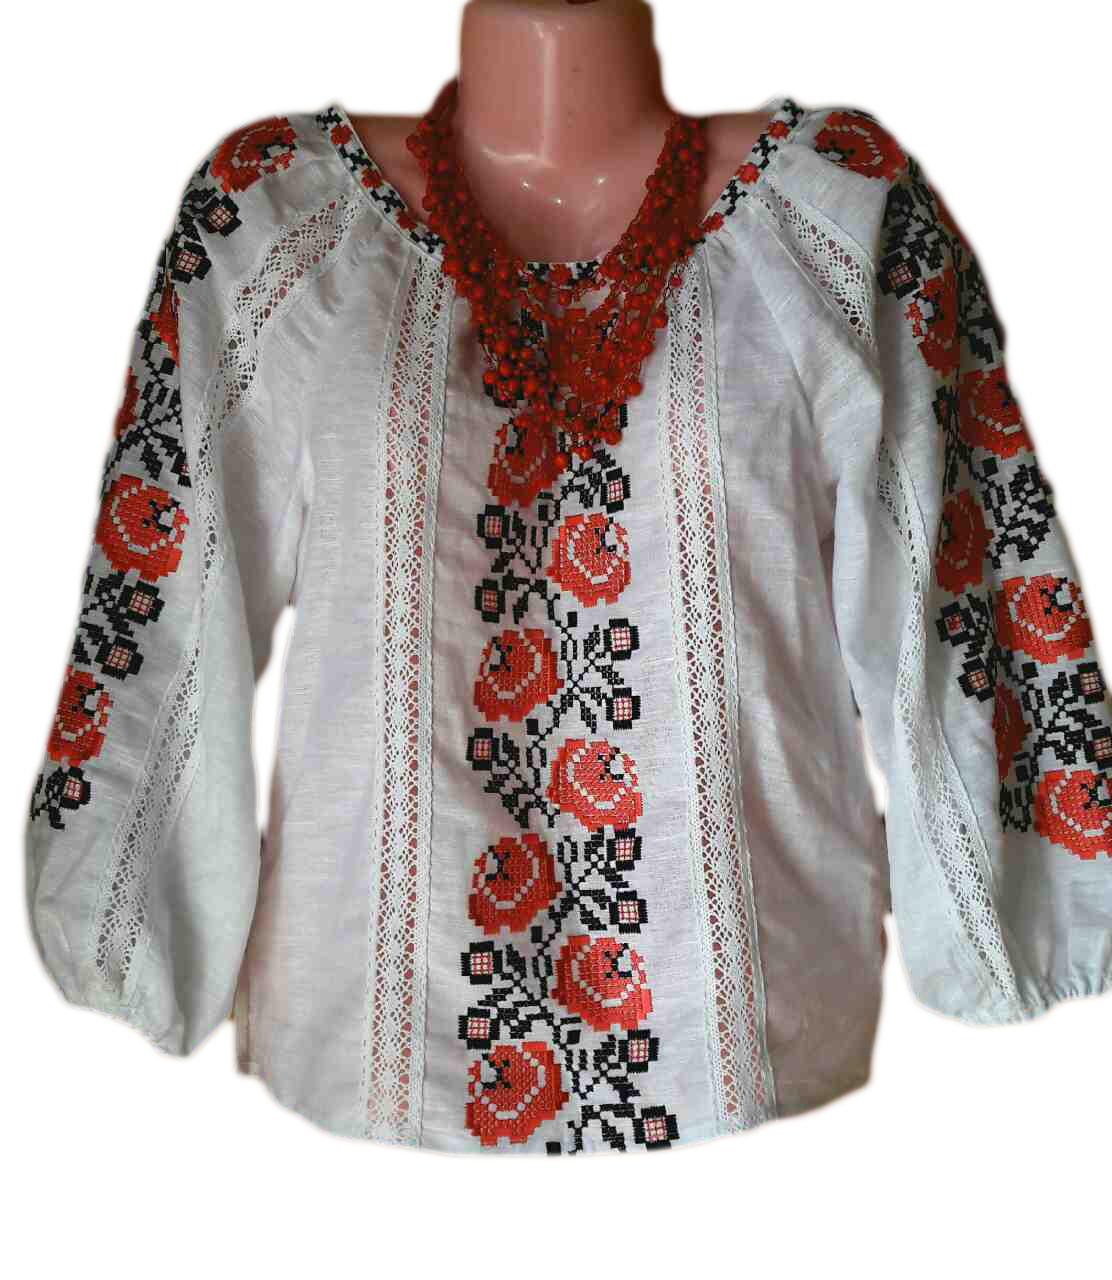 "Жіноча вишита сорочка (блузка) ""Жаклін "" (Женская вышитая рубашка (блузка) ""Жаклин "") BK-0004"